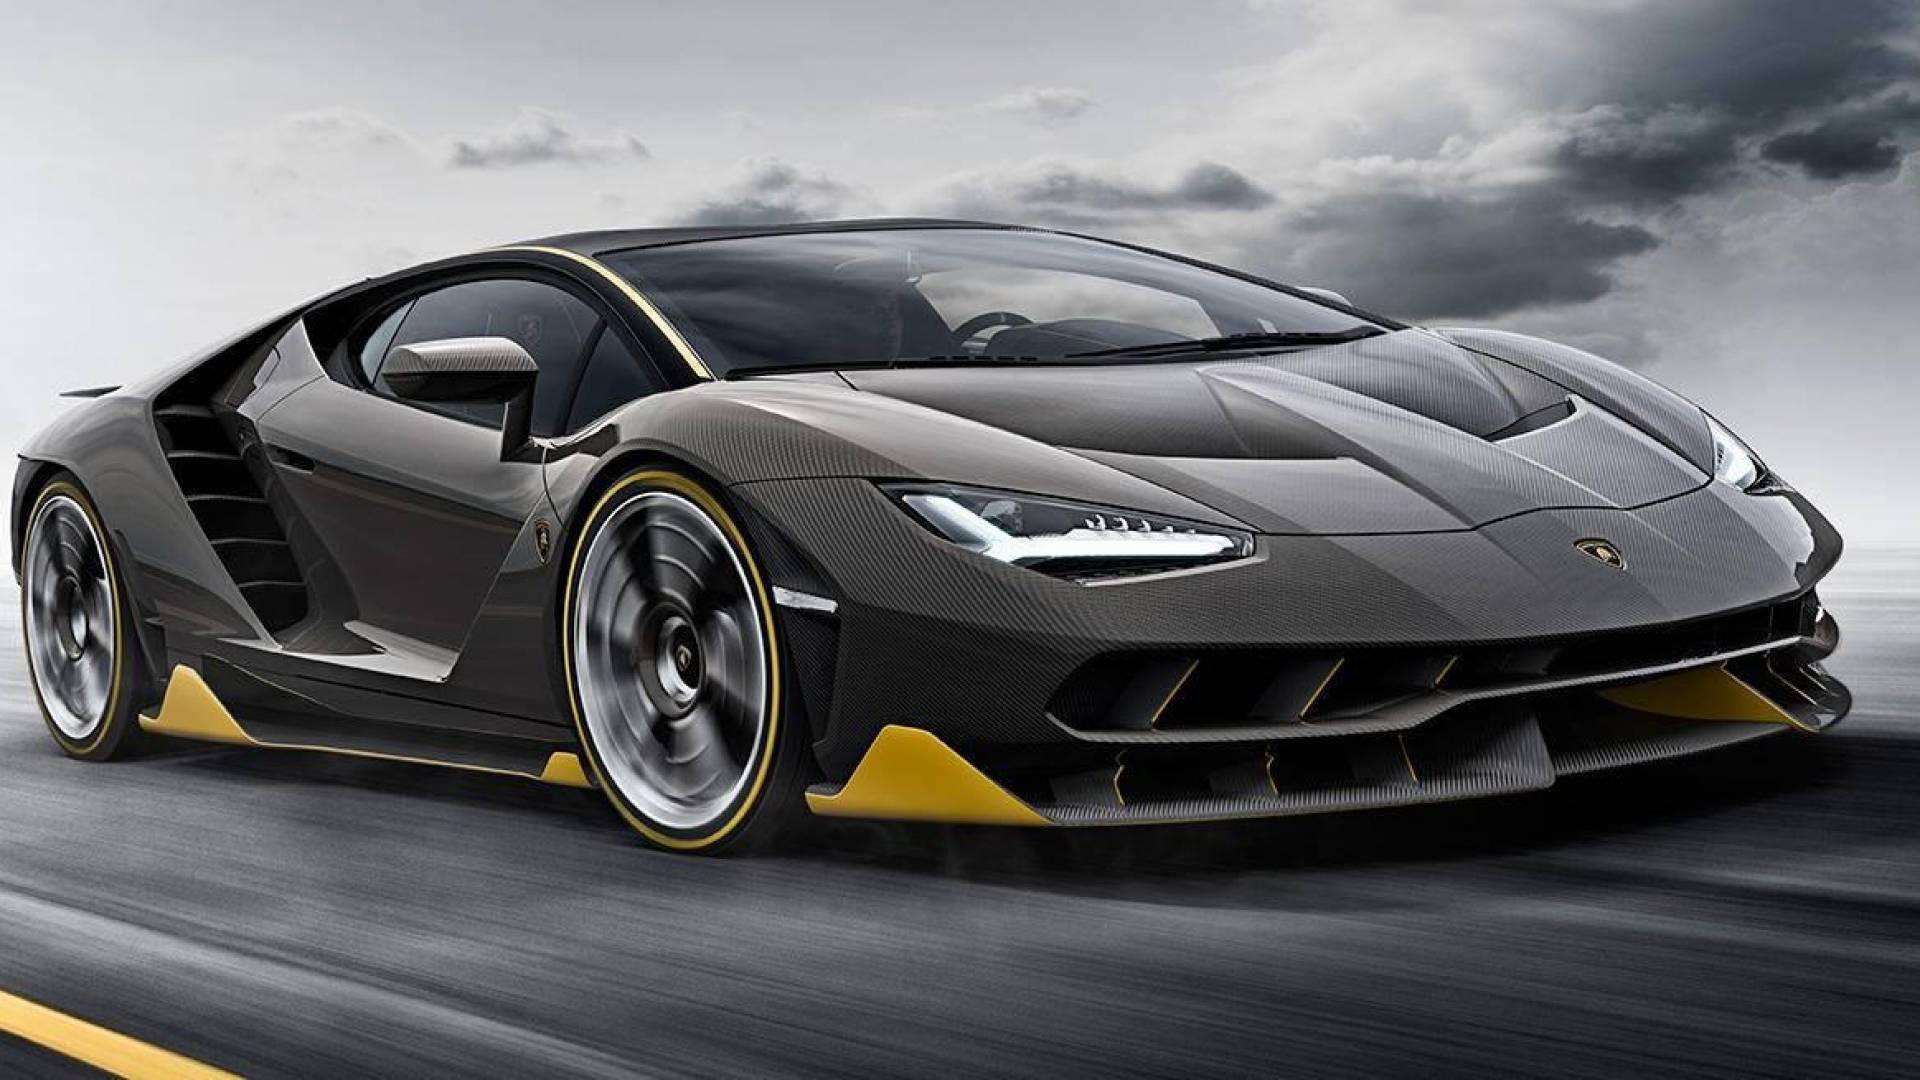 Lamborghini centenario cost